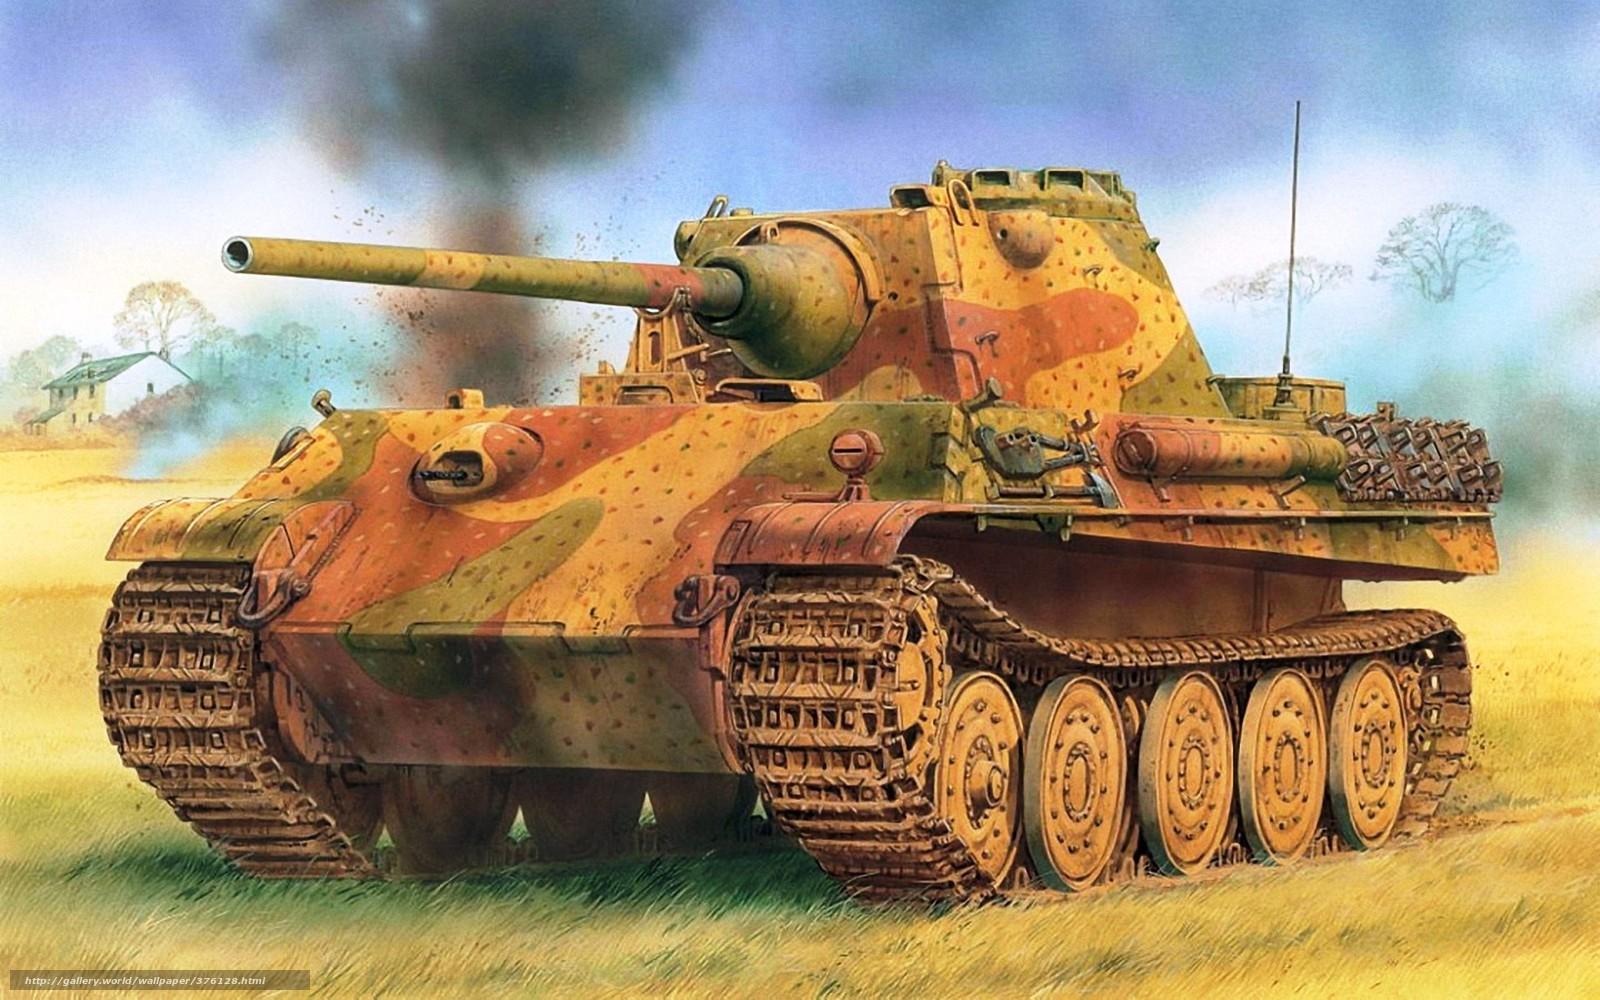 panther tank wallpaper hd - photo #20